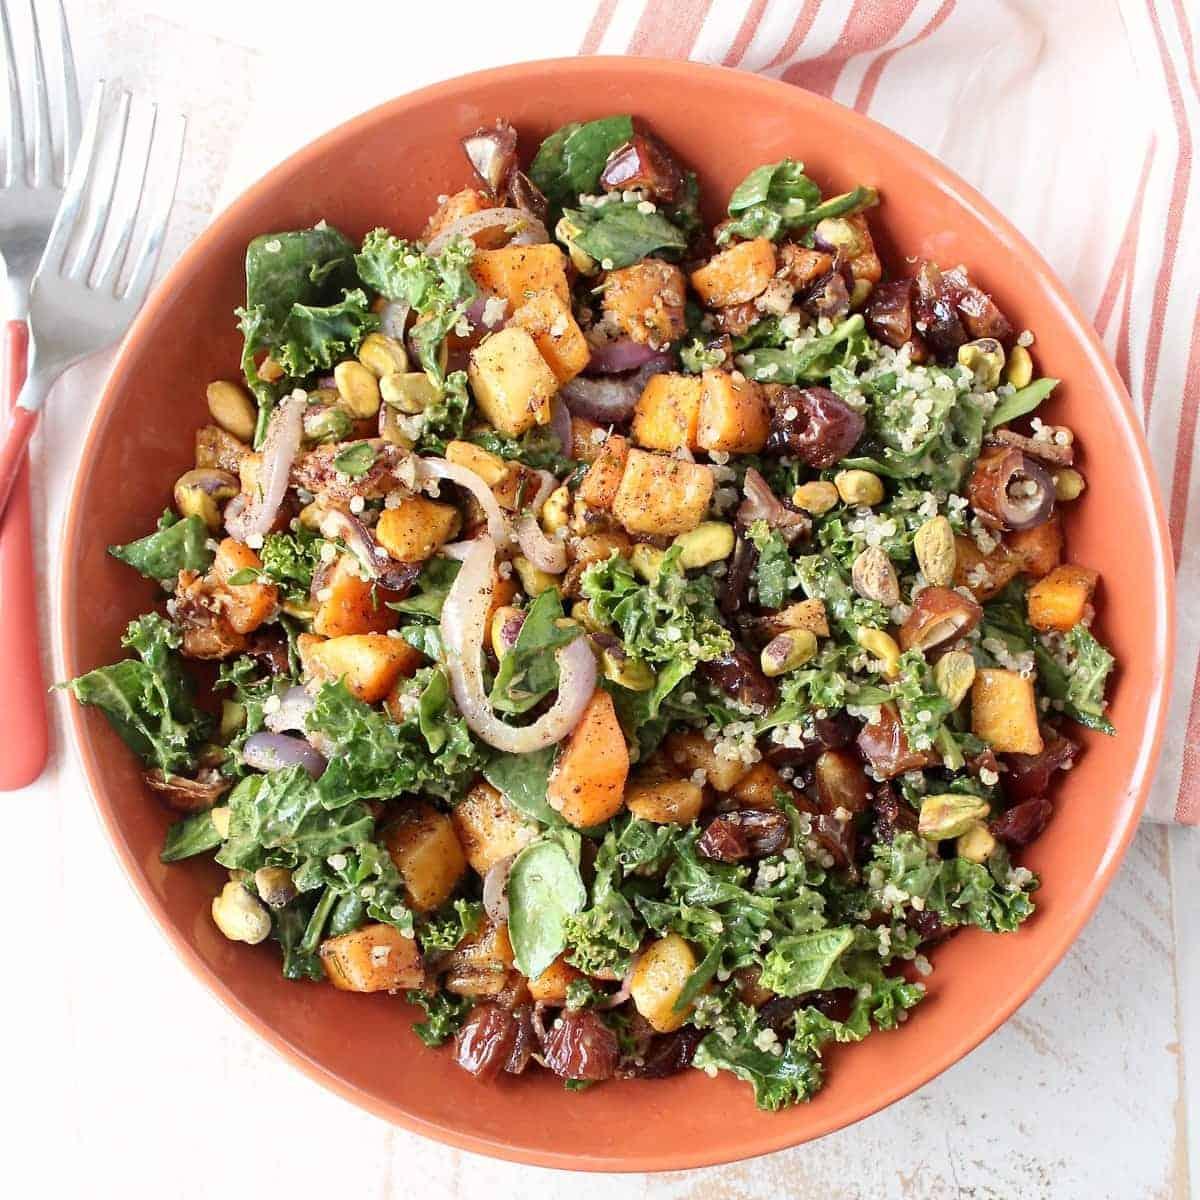 Roasted Butternut Squash Kale SaladWhitneyBond.com